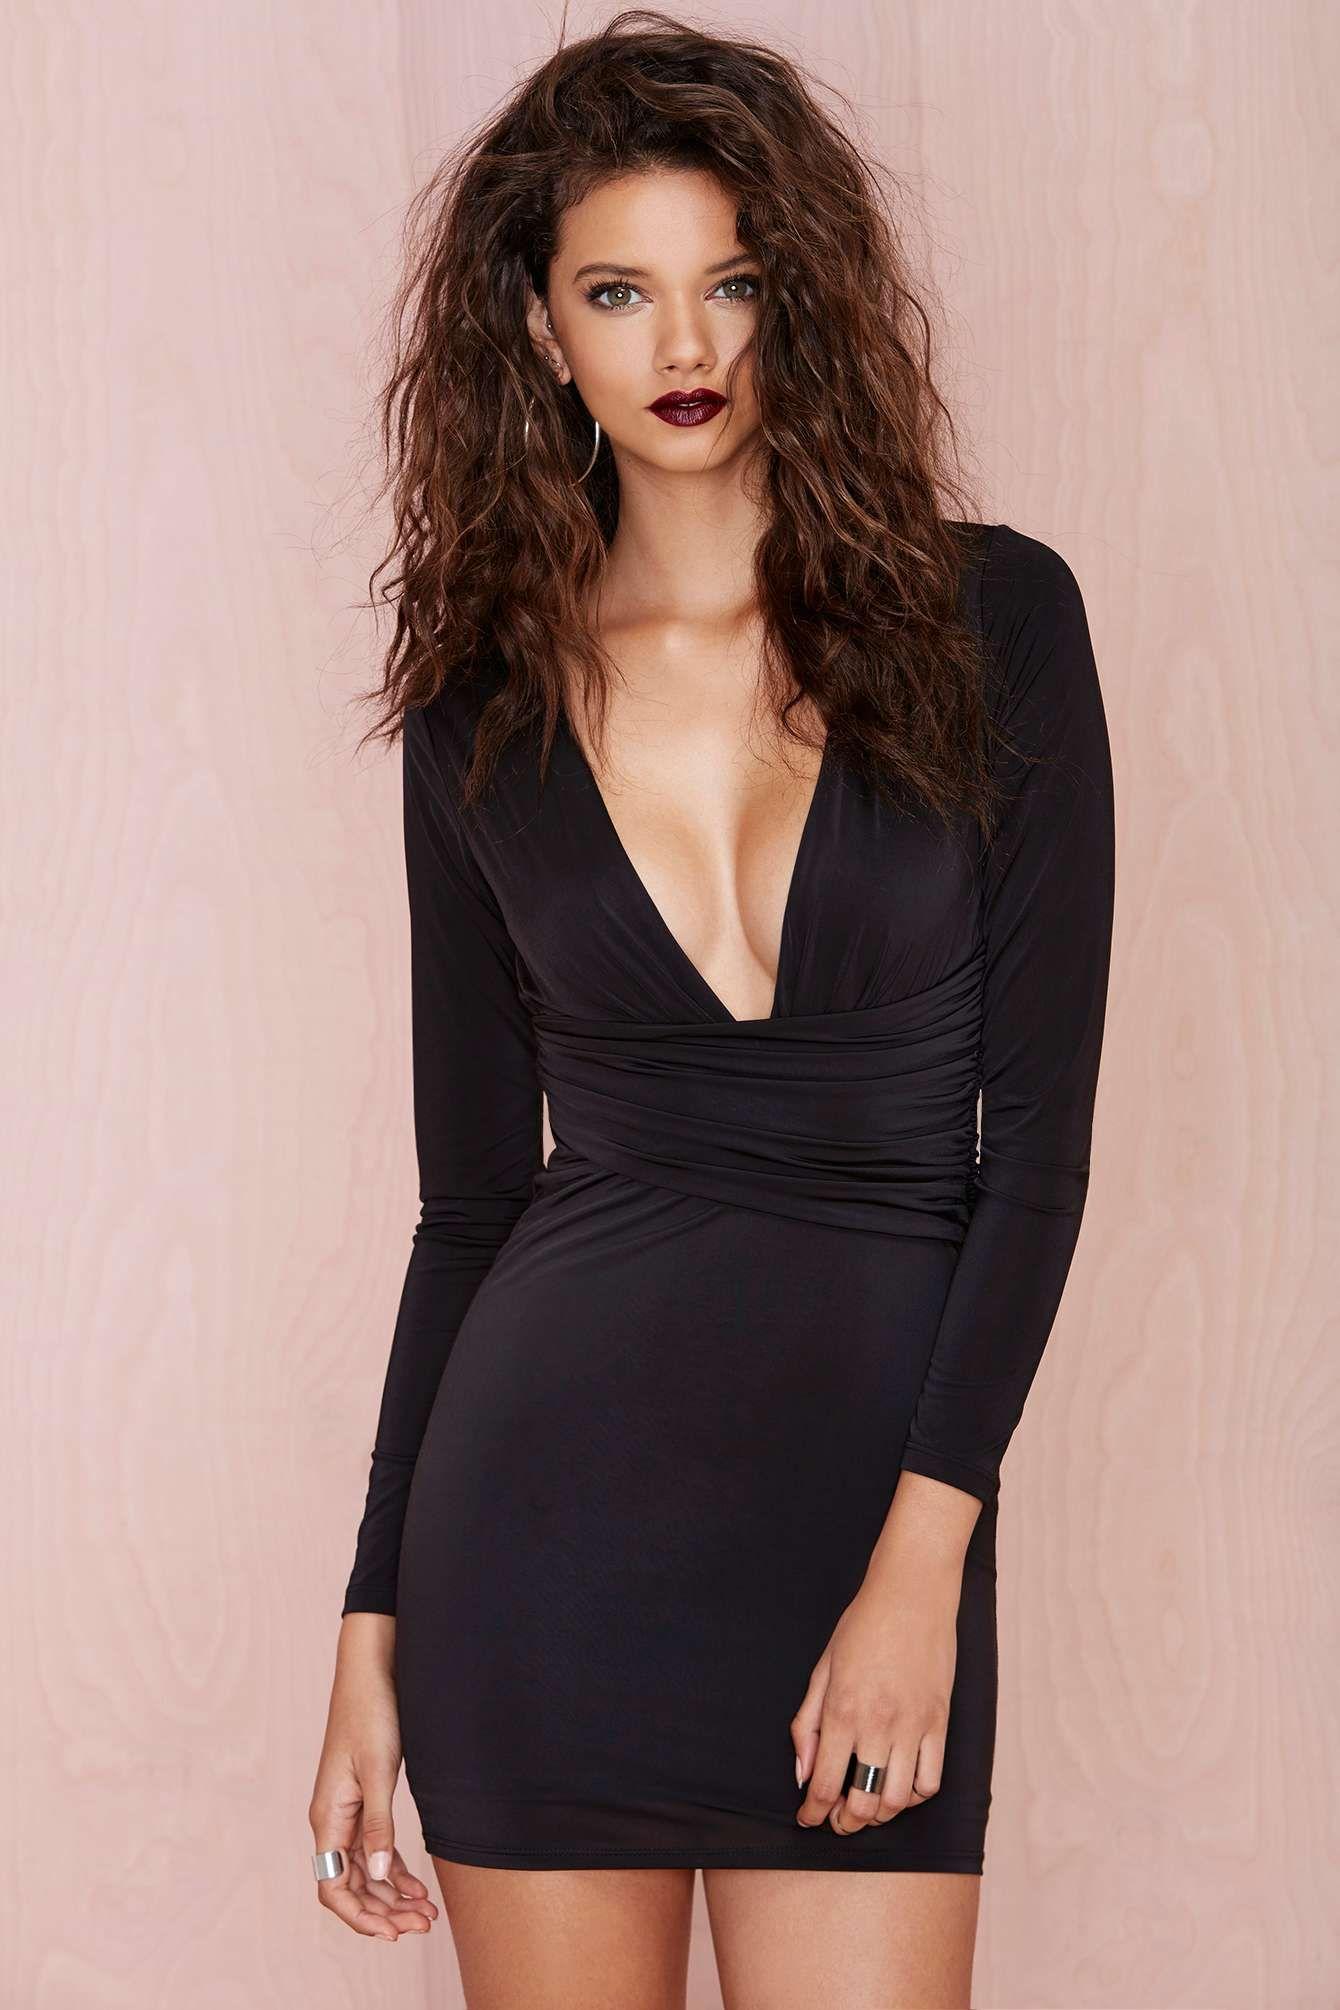 Nasty gal alina dress shop dresses at nasty gal imagenes